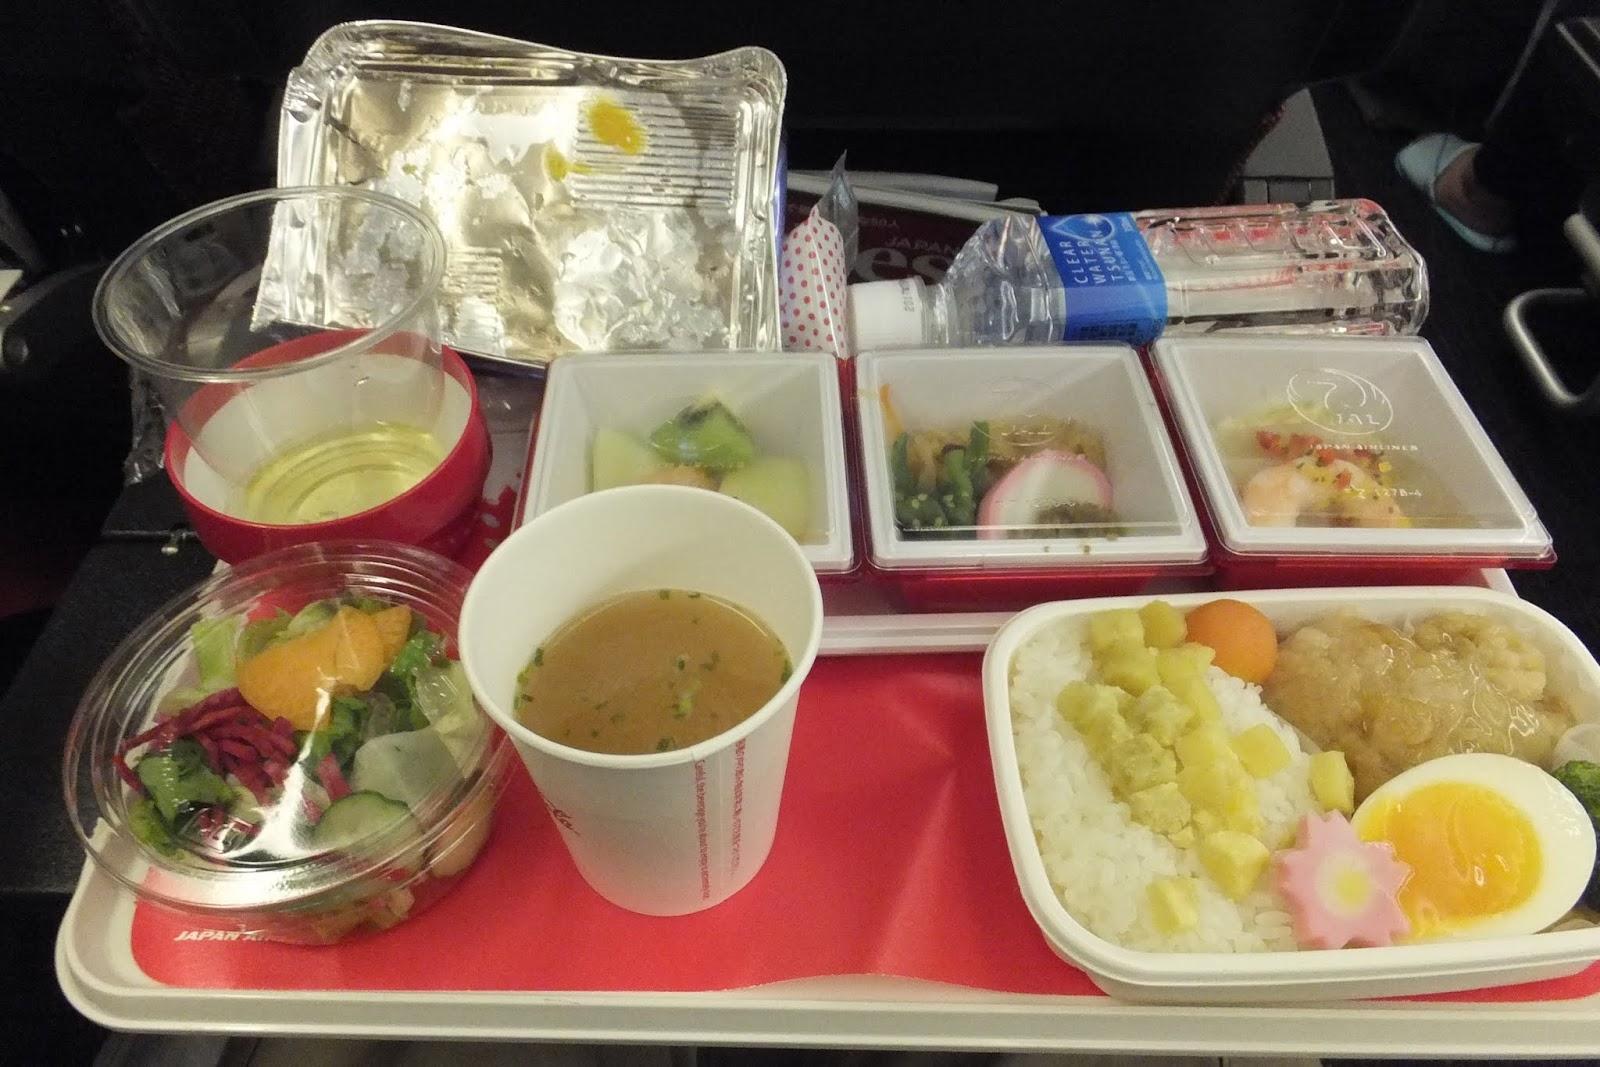 jl751flight-meal l751機内食